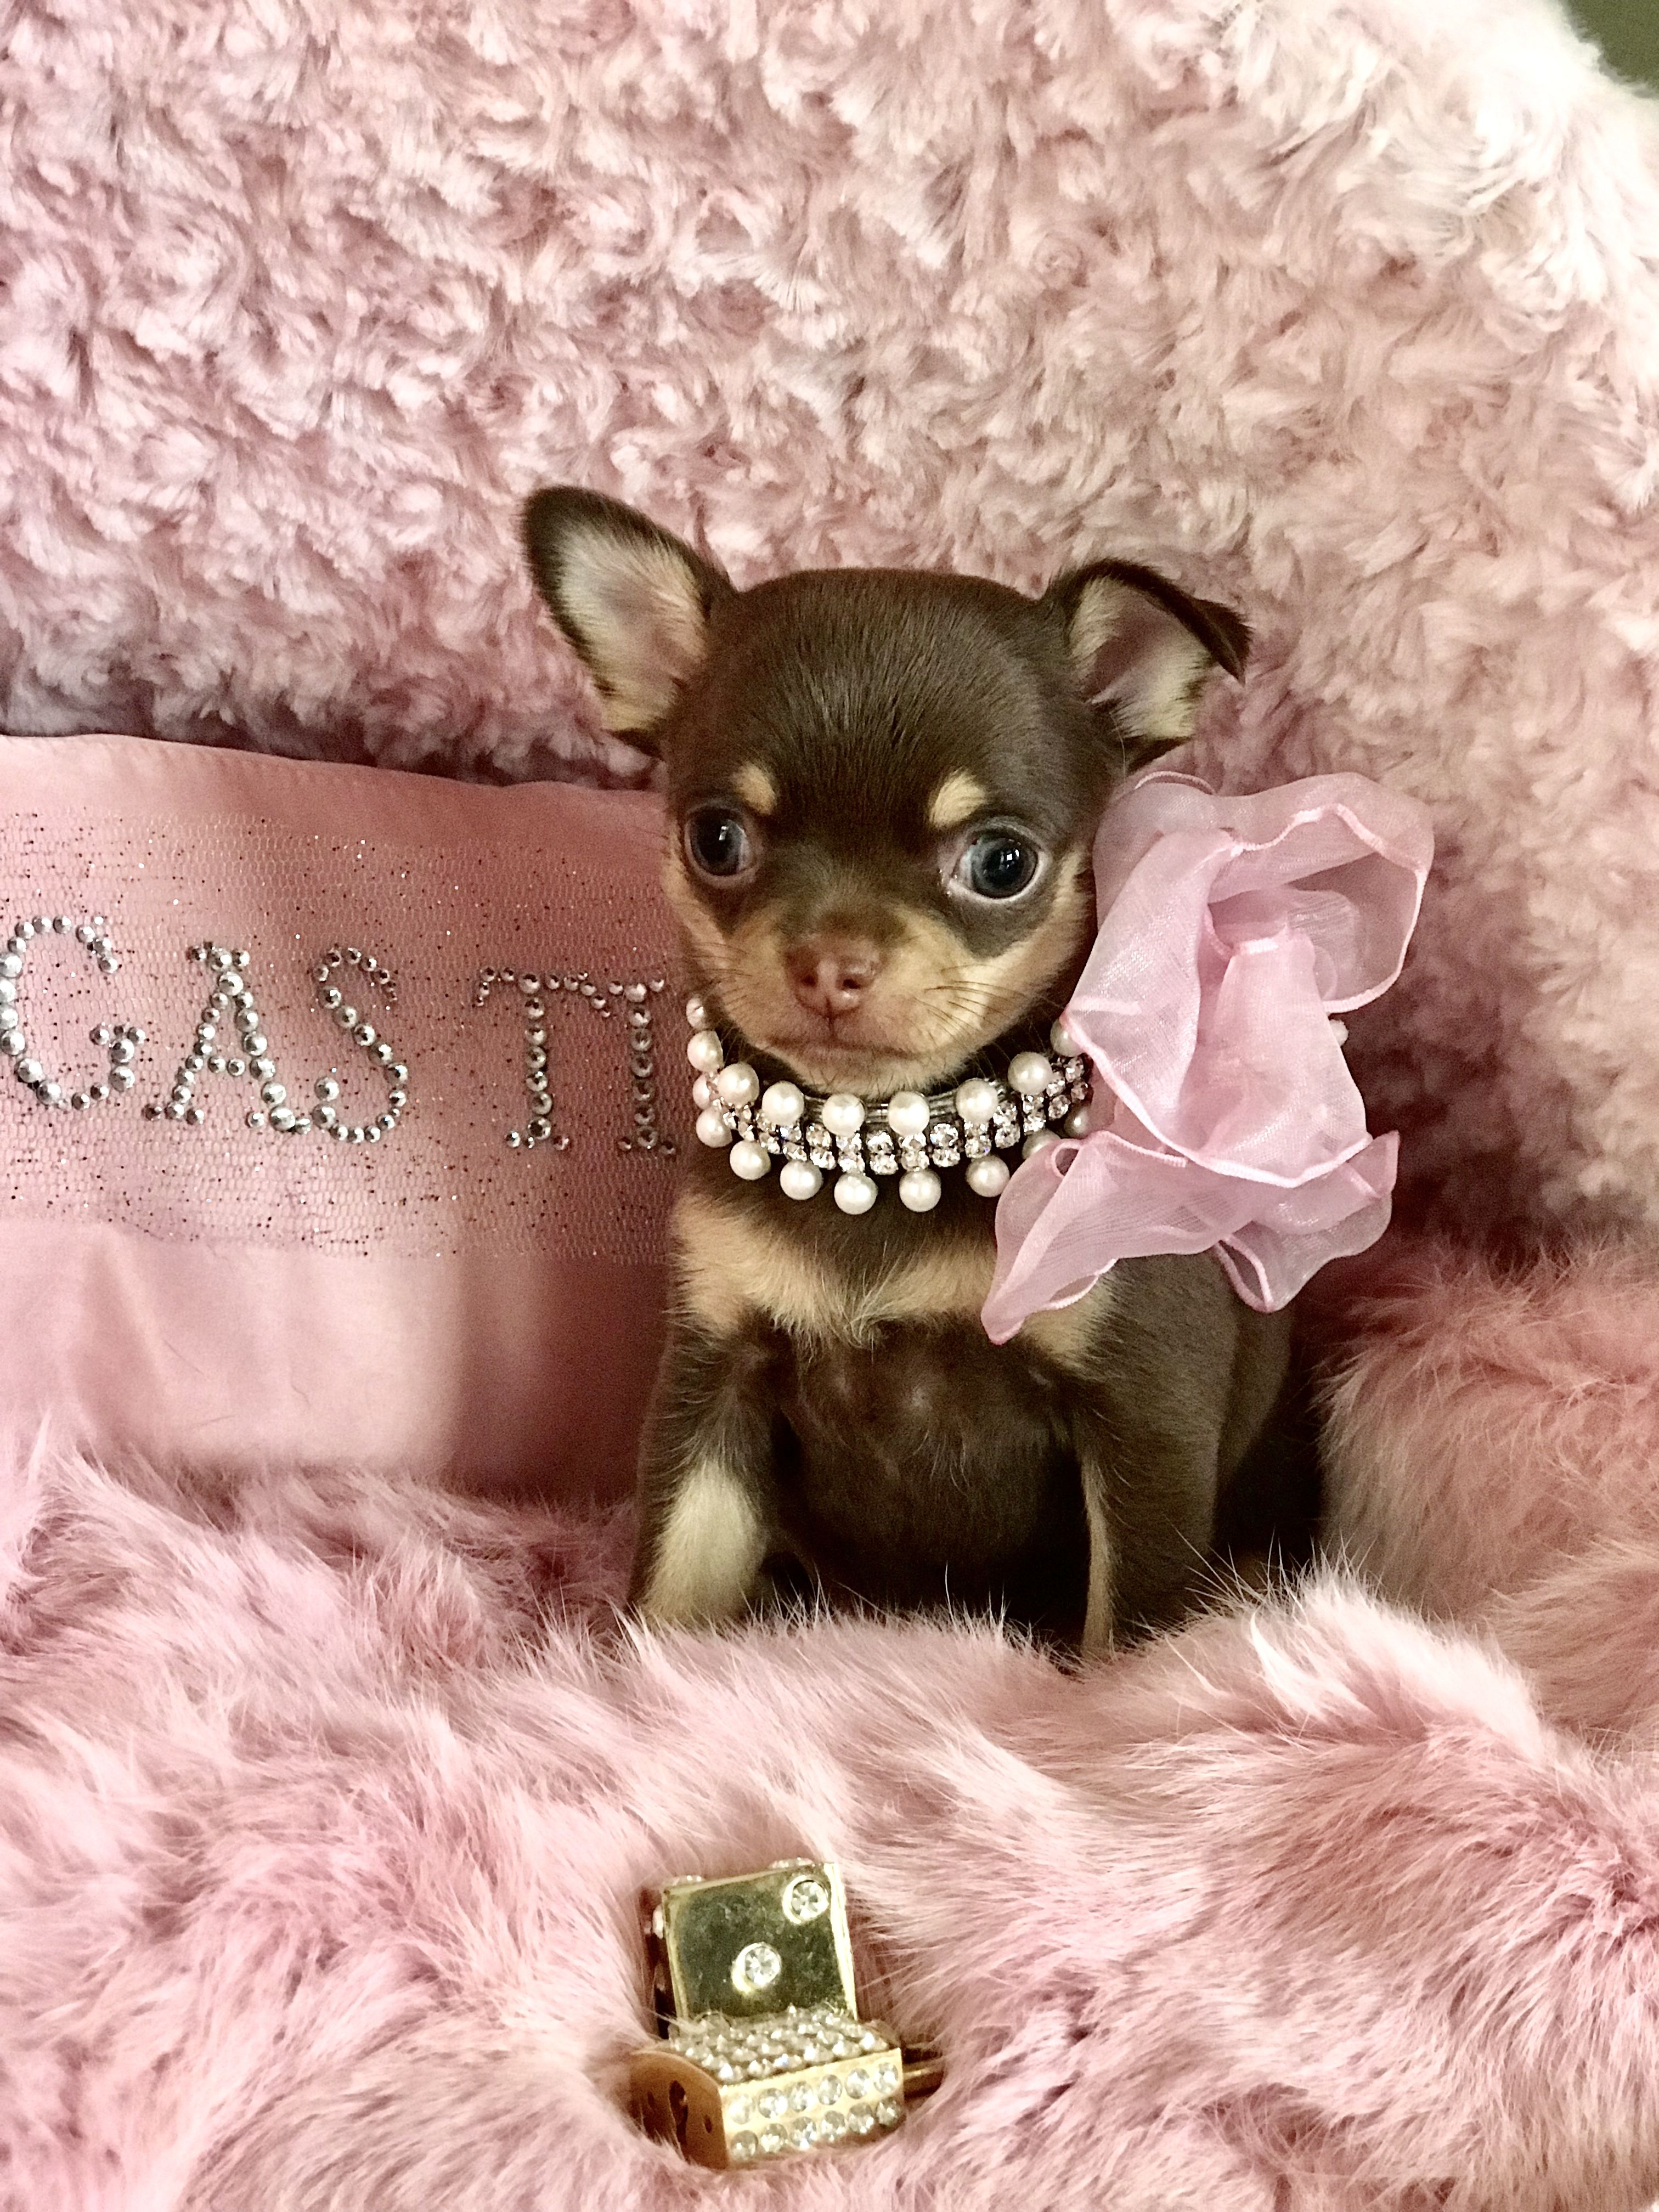 Pin By Las Vegas Tiny Chihuahua On Chihuahua Chihuahua Puppy